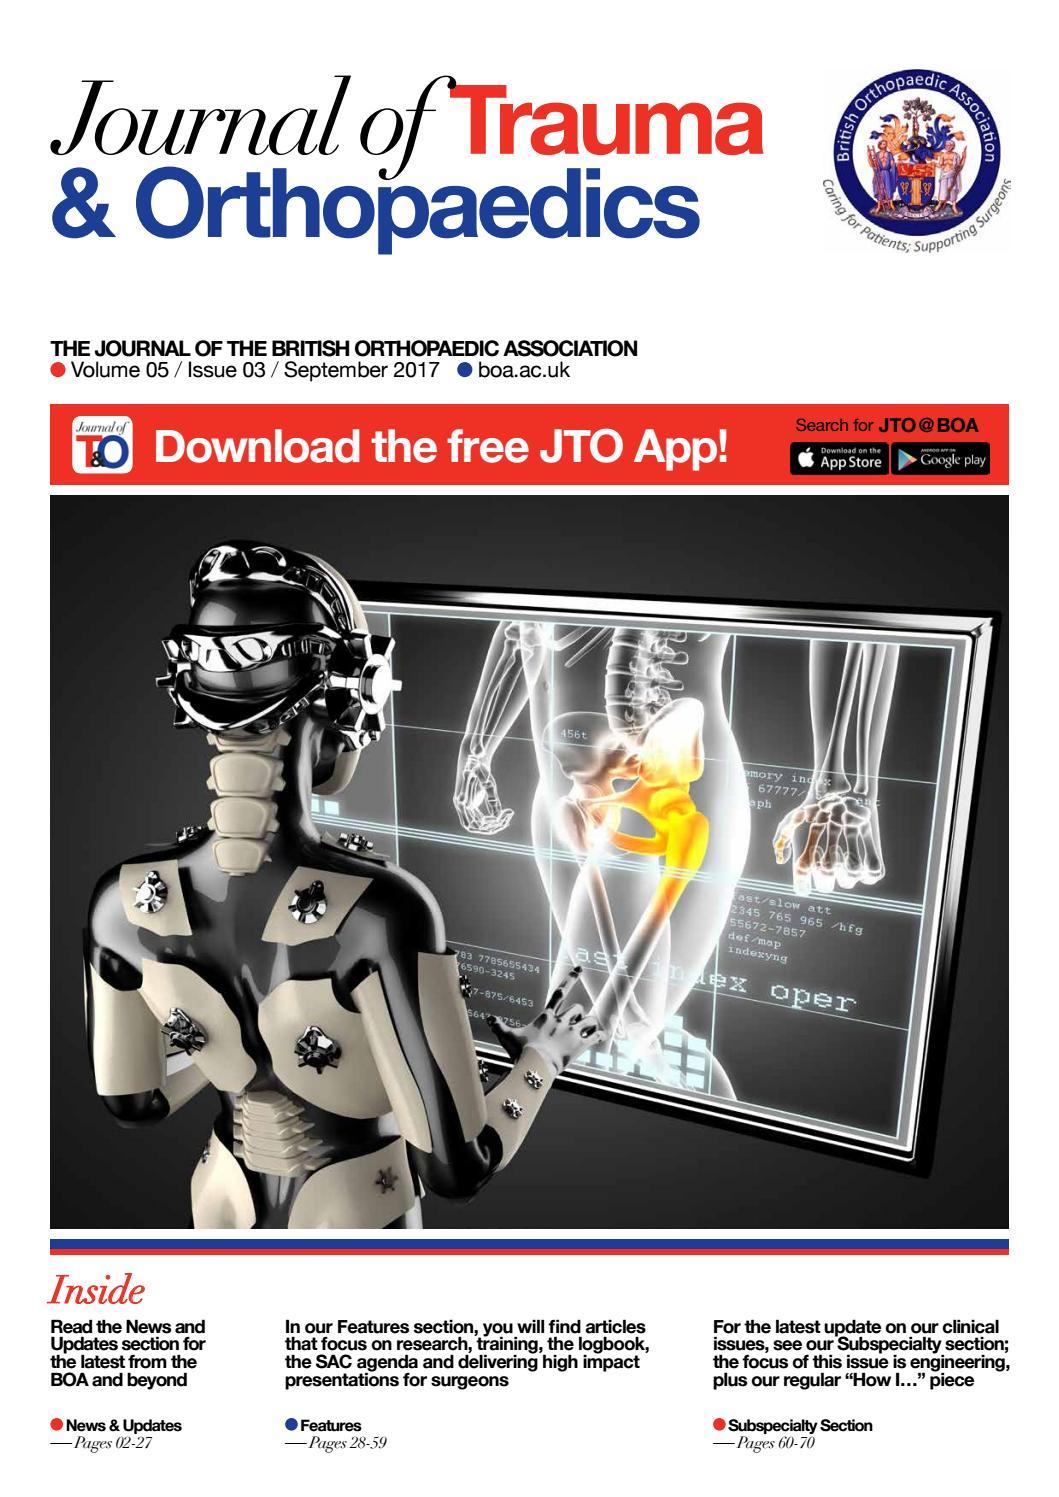 Journal of Trauma & Orthopaedics – Vol 5 Iss 3 by British